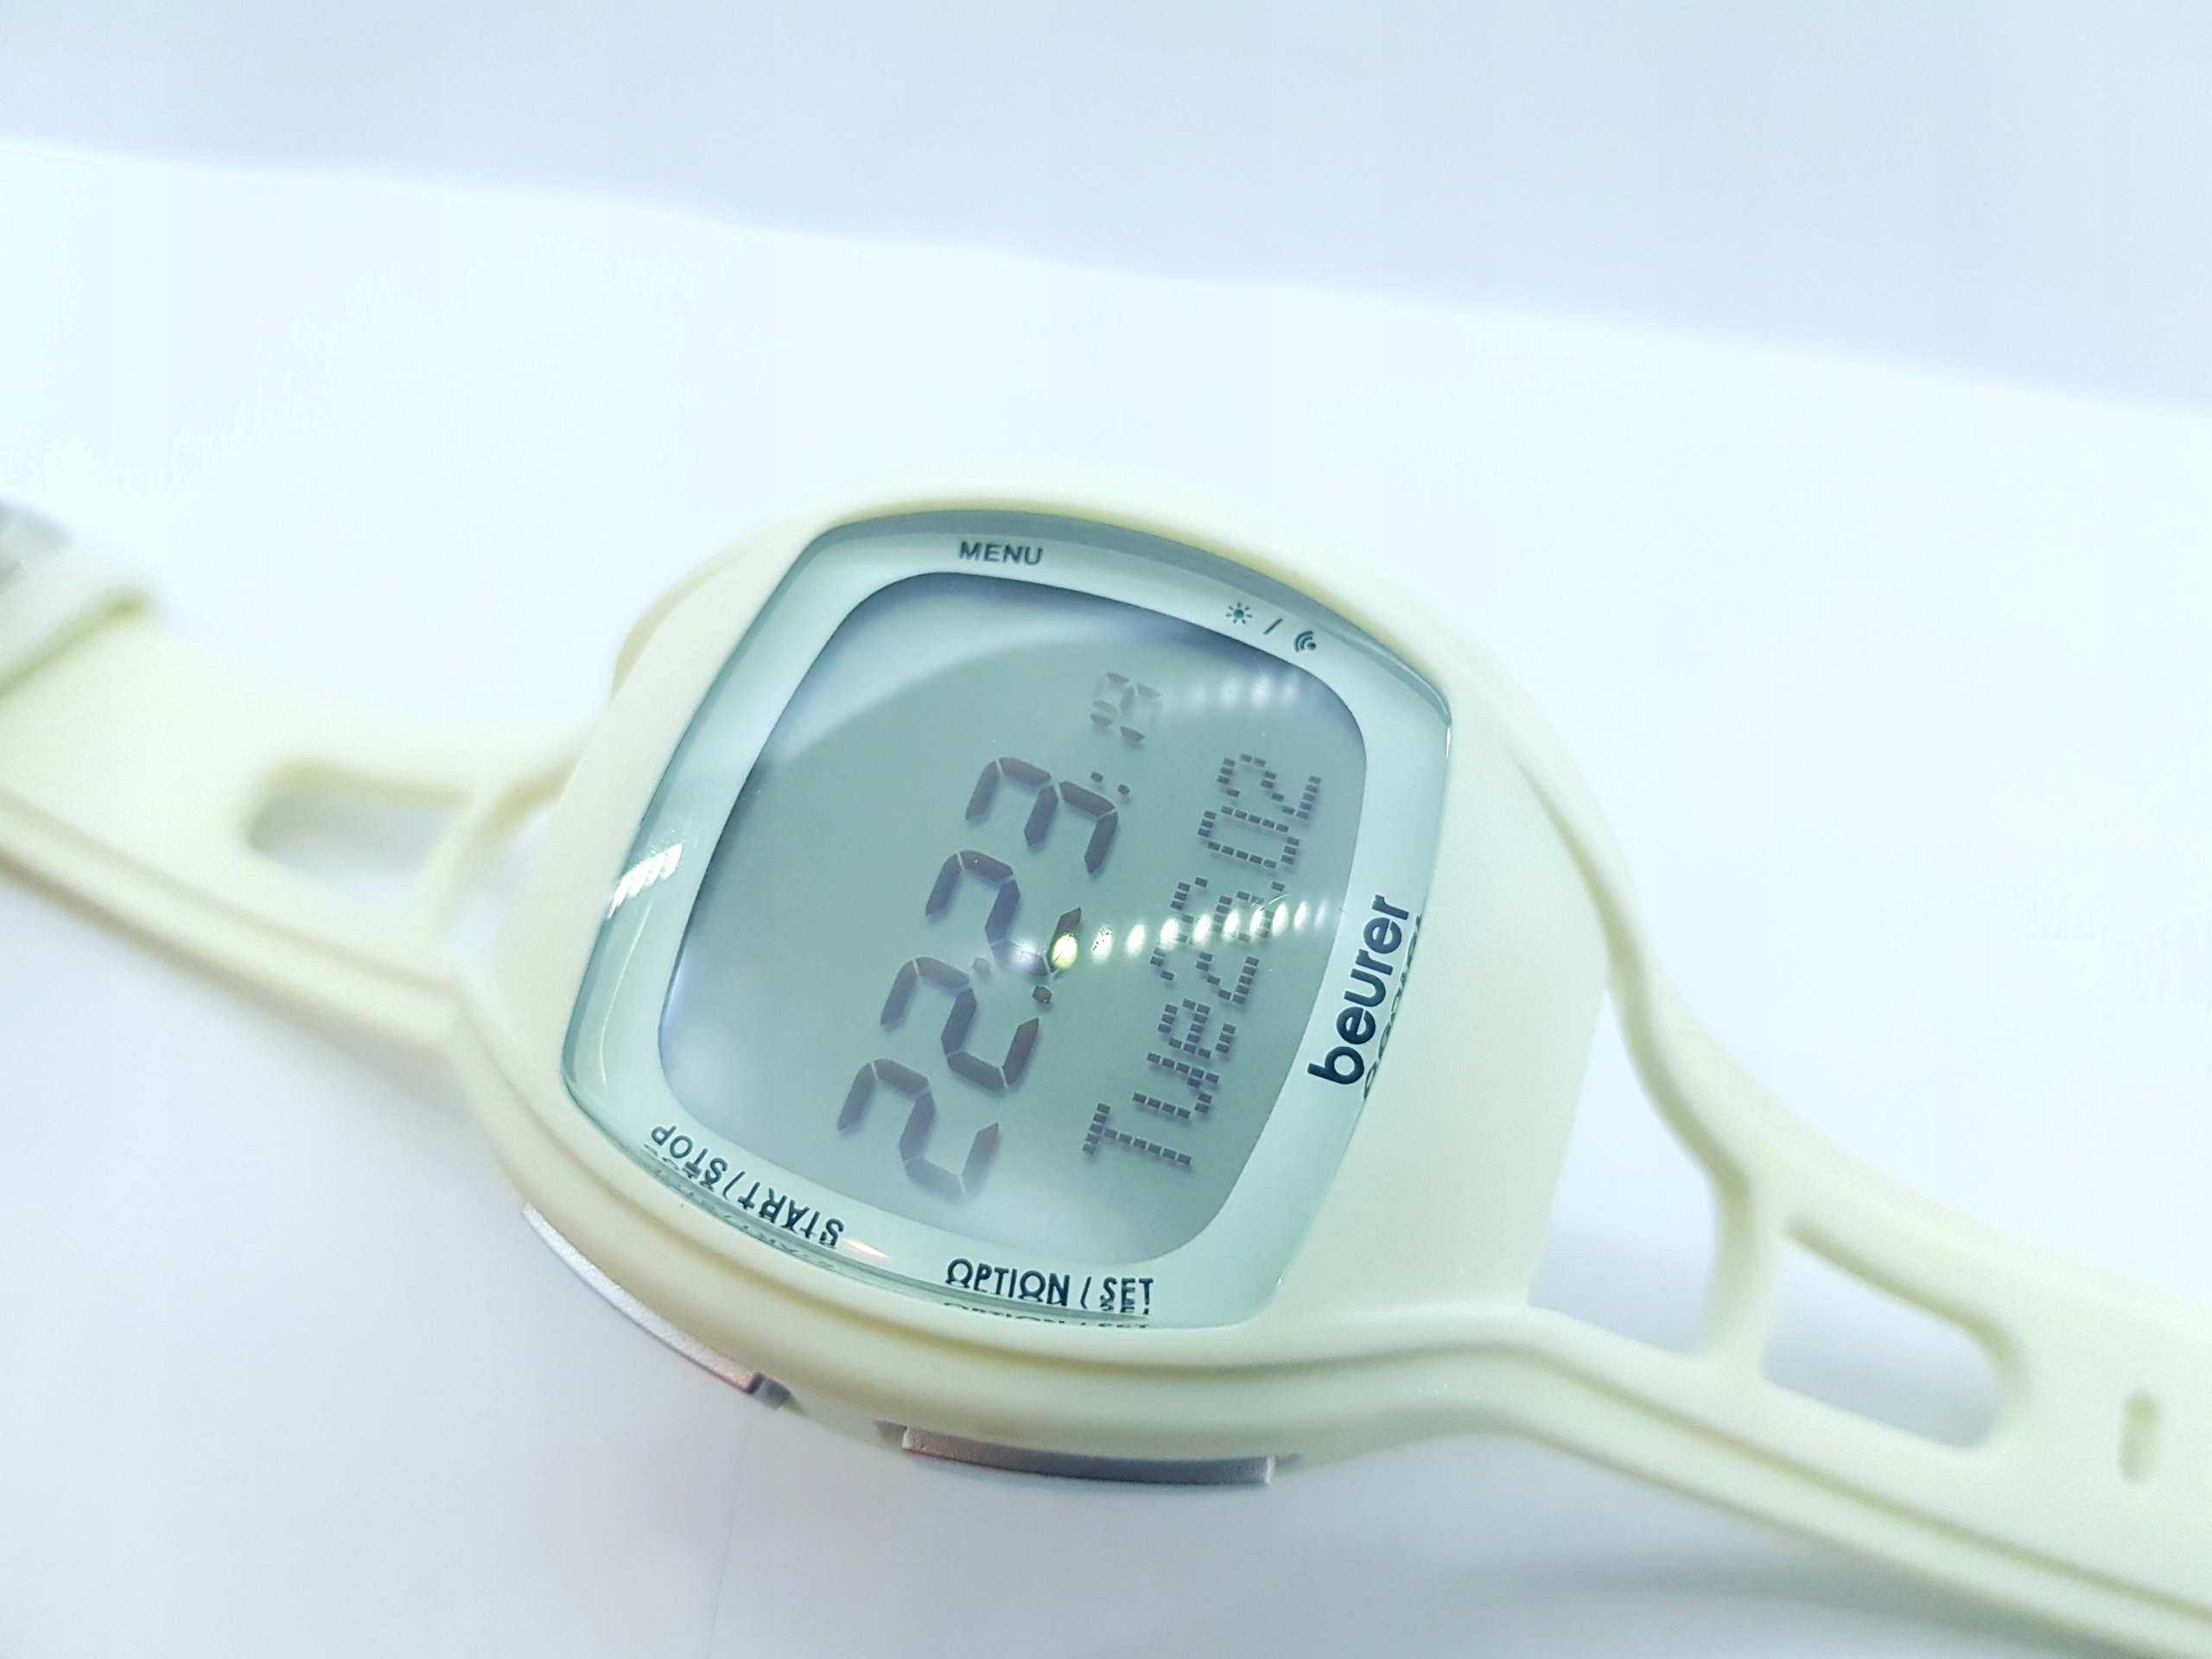 Zegarek sportowy BEURER PM 45